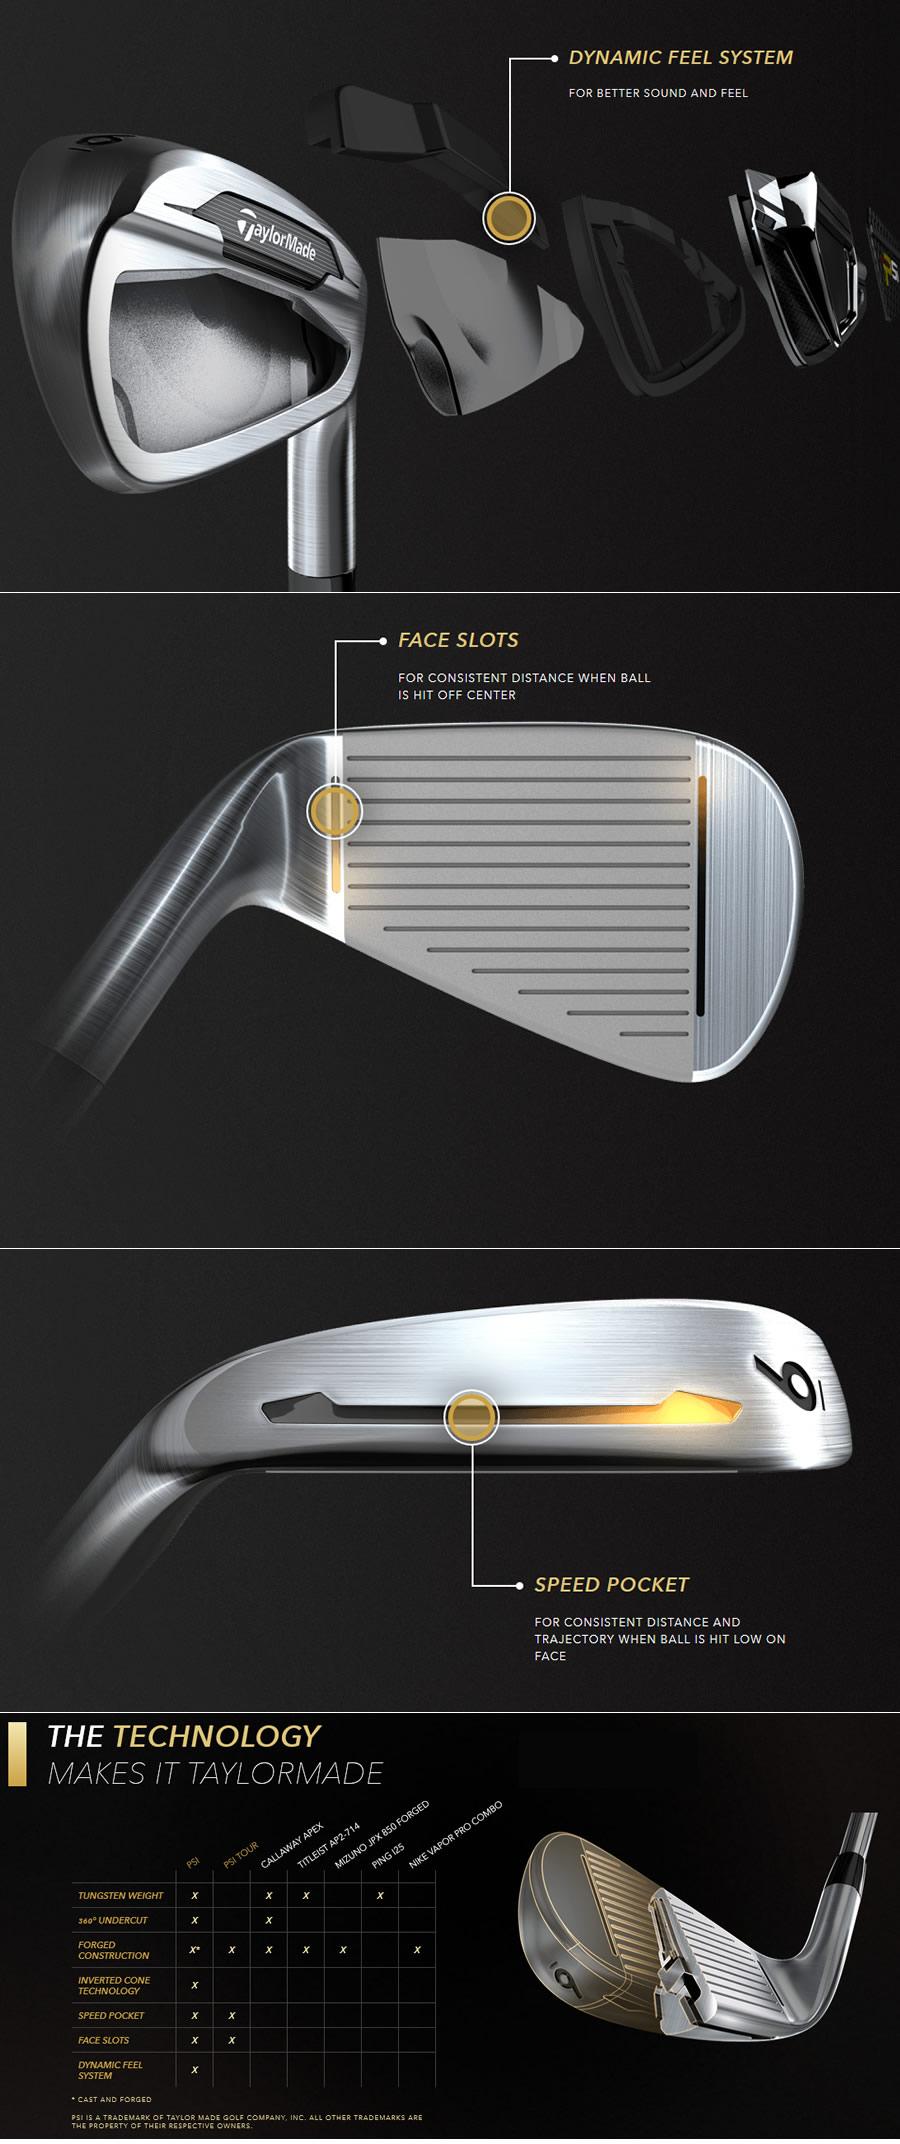 TaylorMade PSi Tour Golf Iron Technology